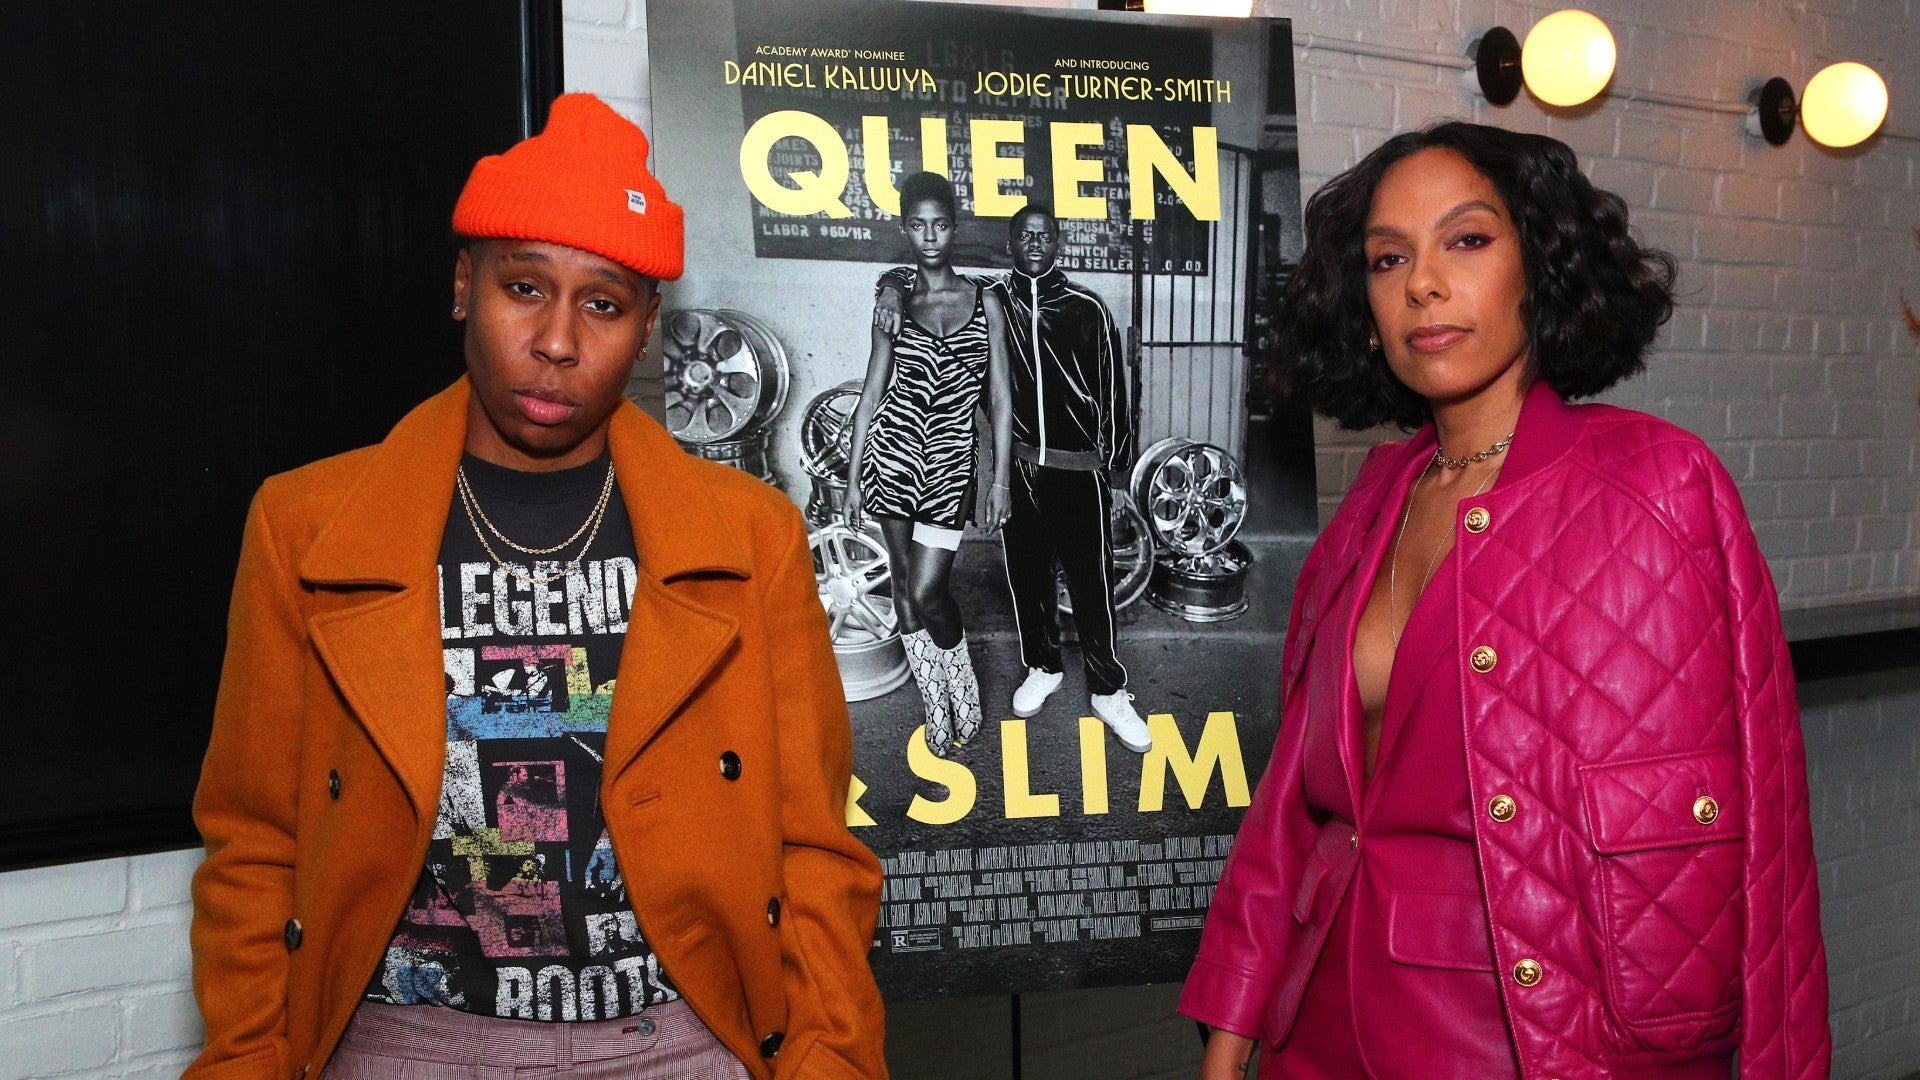 Celebrities Praise Photo From Hair Scene In 'Queen & Slim'